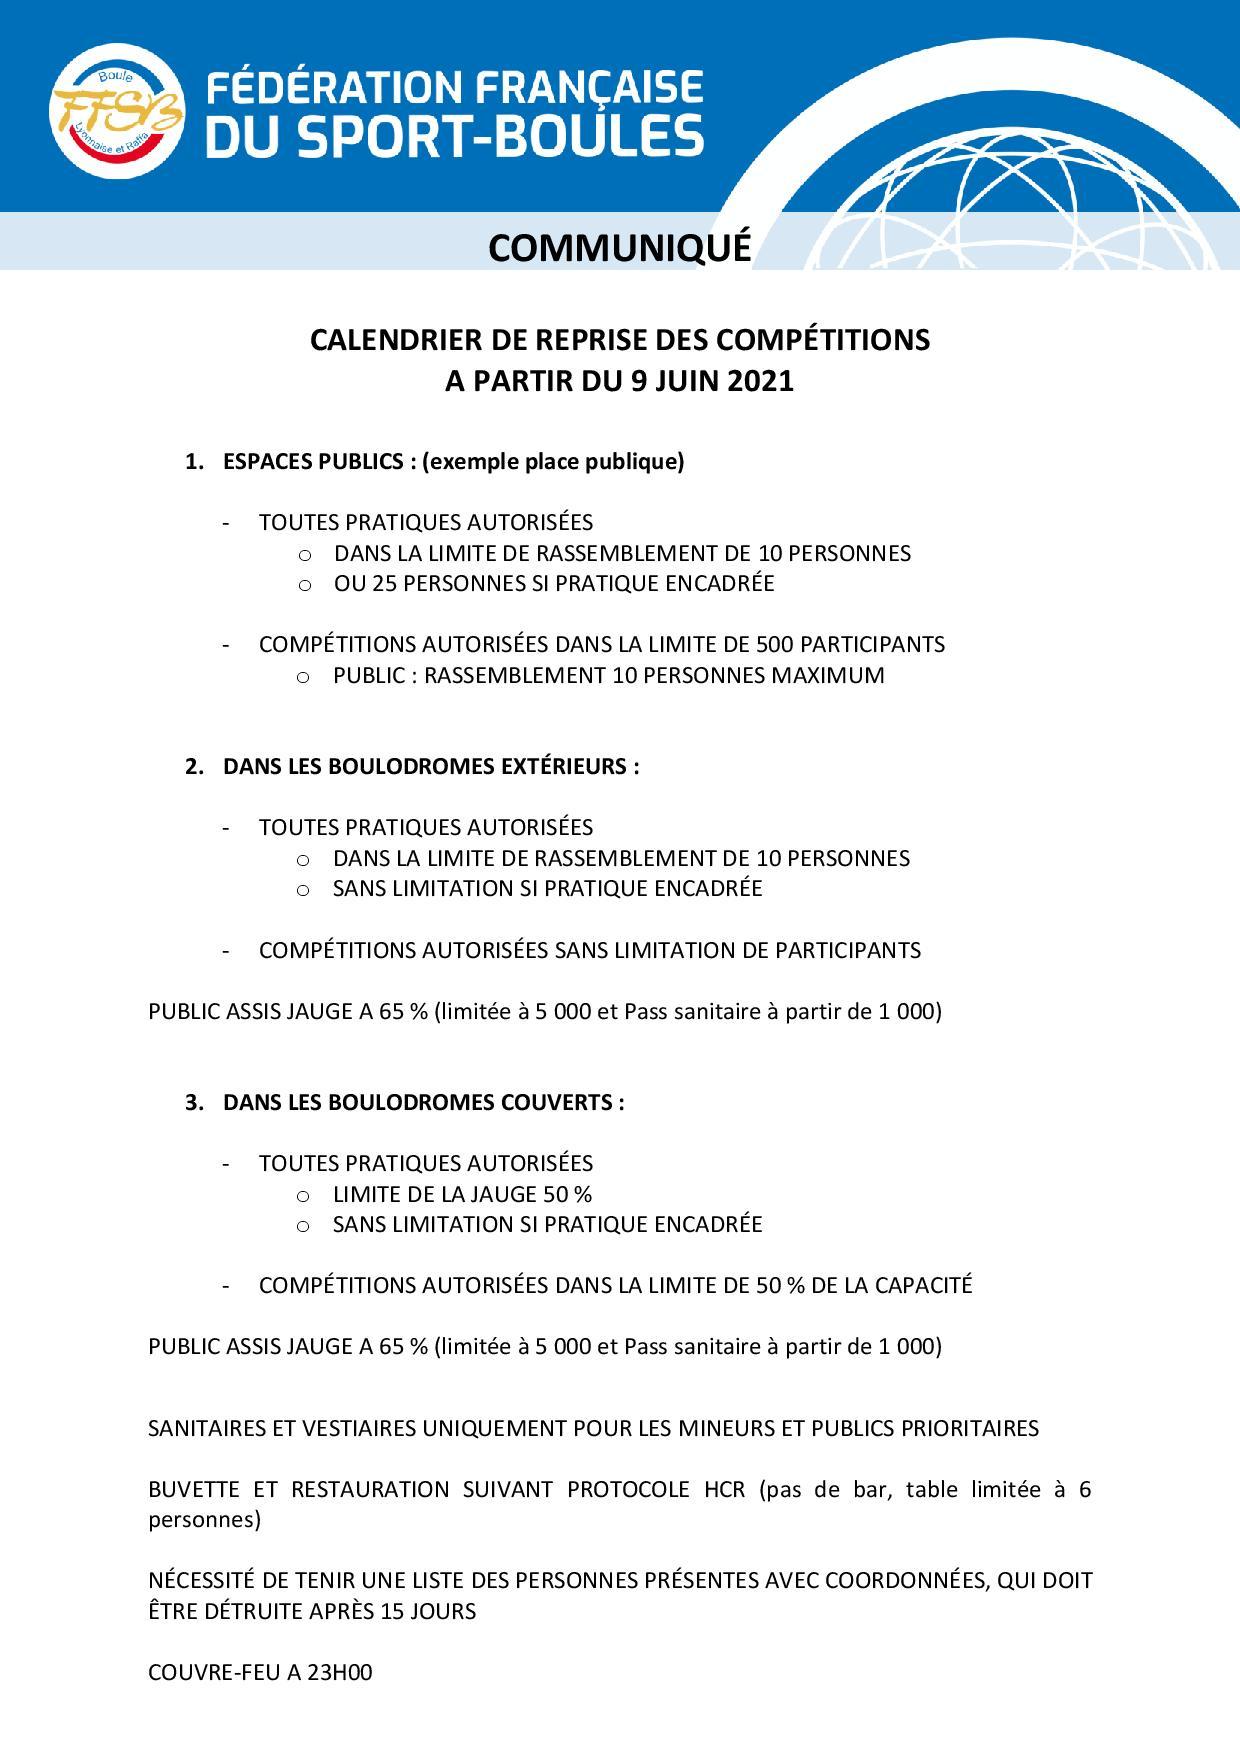 FFSB Communiqué 09-06-21-page-001.jpg